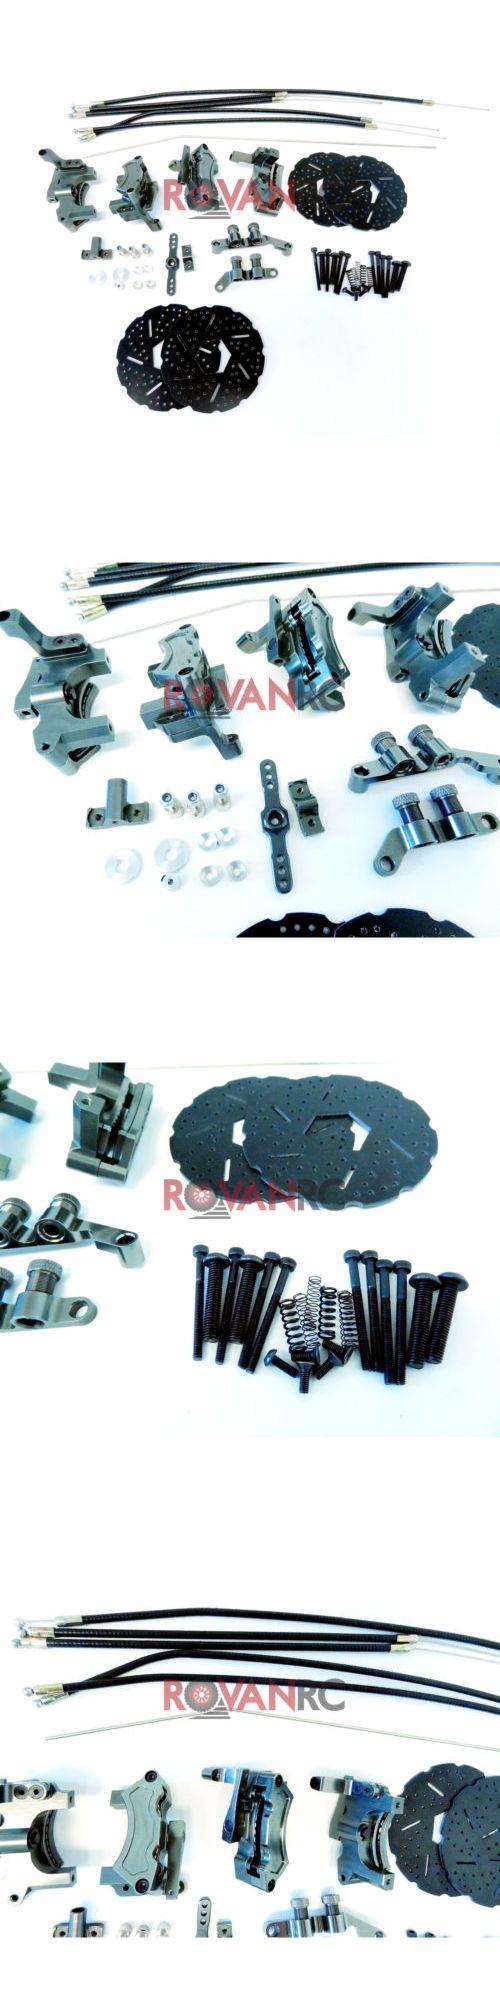 5SC BAJ128PURPLE Alloy Hydraulic Front Brake System for HPI Baja 5B 5T 5B2.0